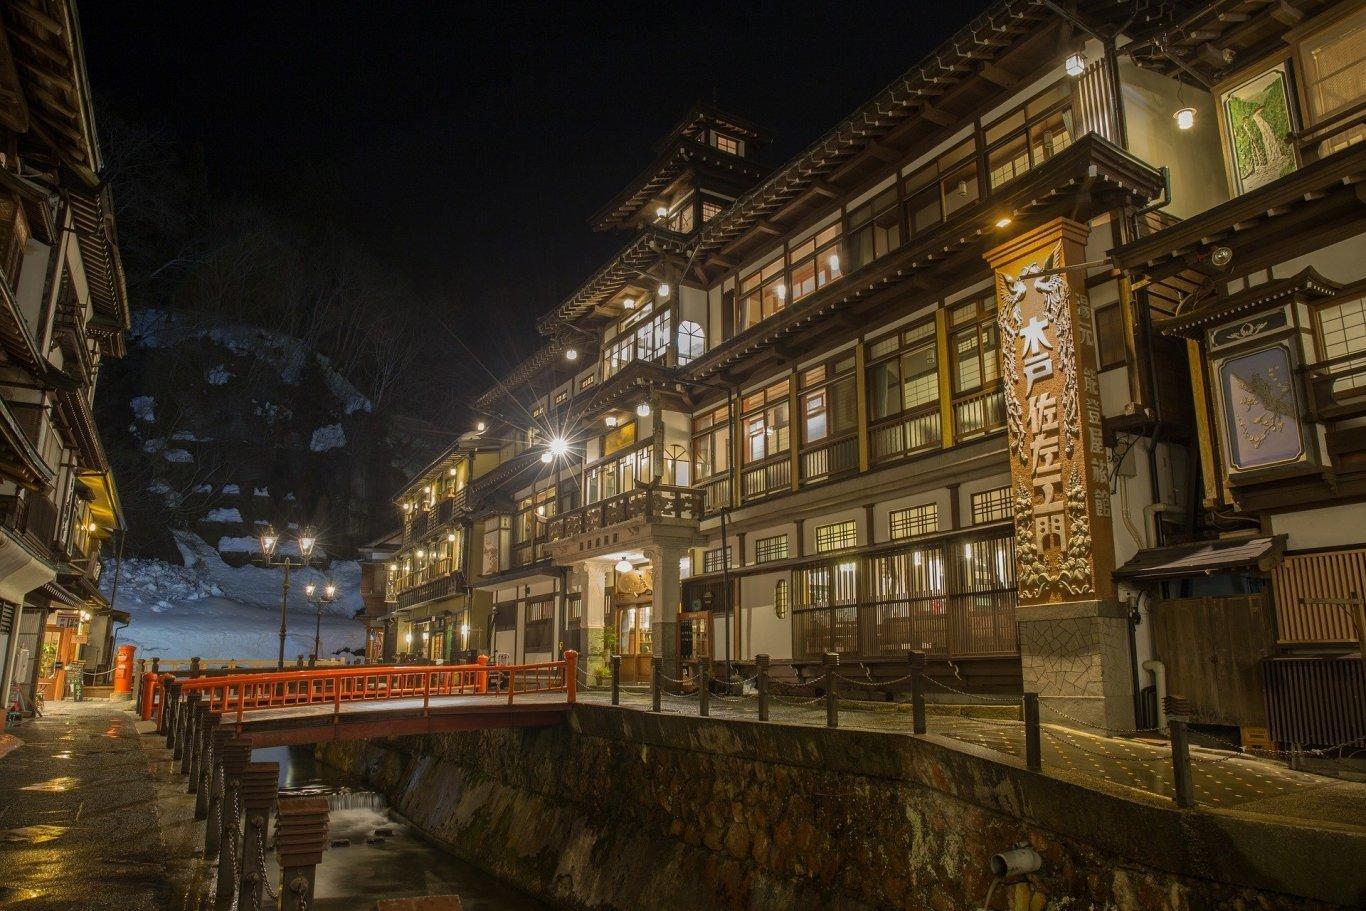 5-Day Tohoku Sake Tour - Japan Itinerary